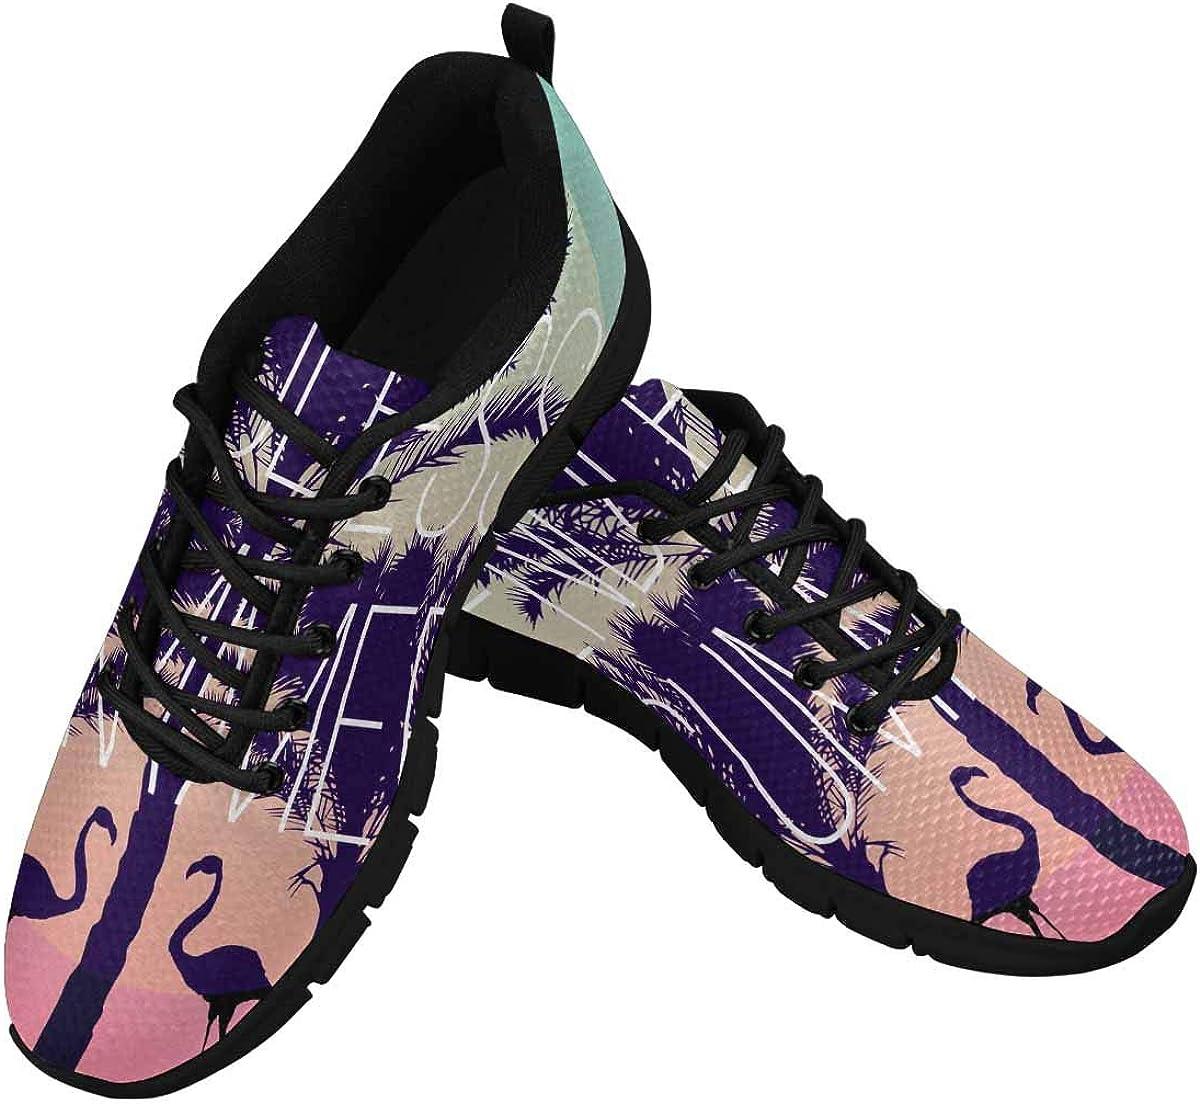 INTERESTPRINT Summer Plam Tree Women's Athletic Walking Shoes Comfort Mesh Non Slip